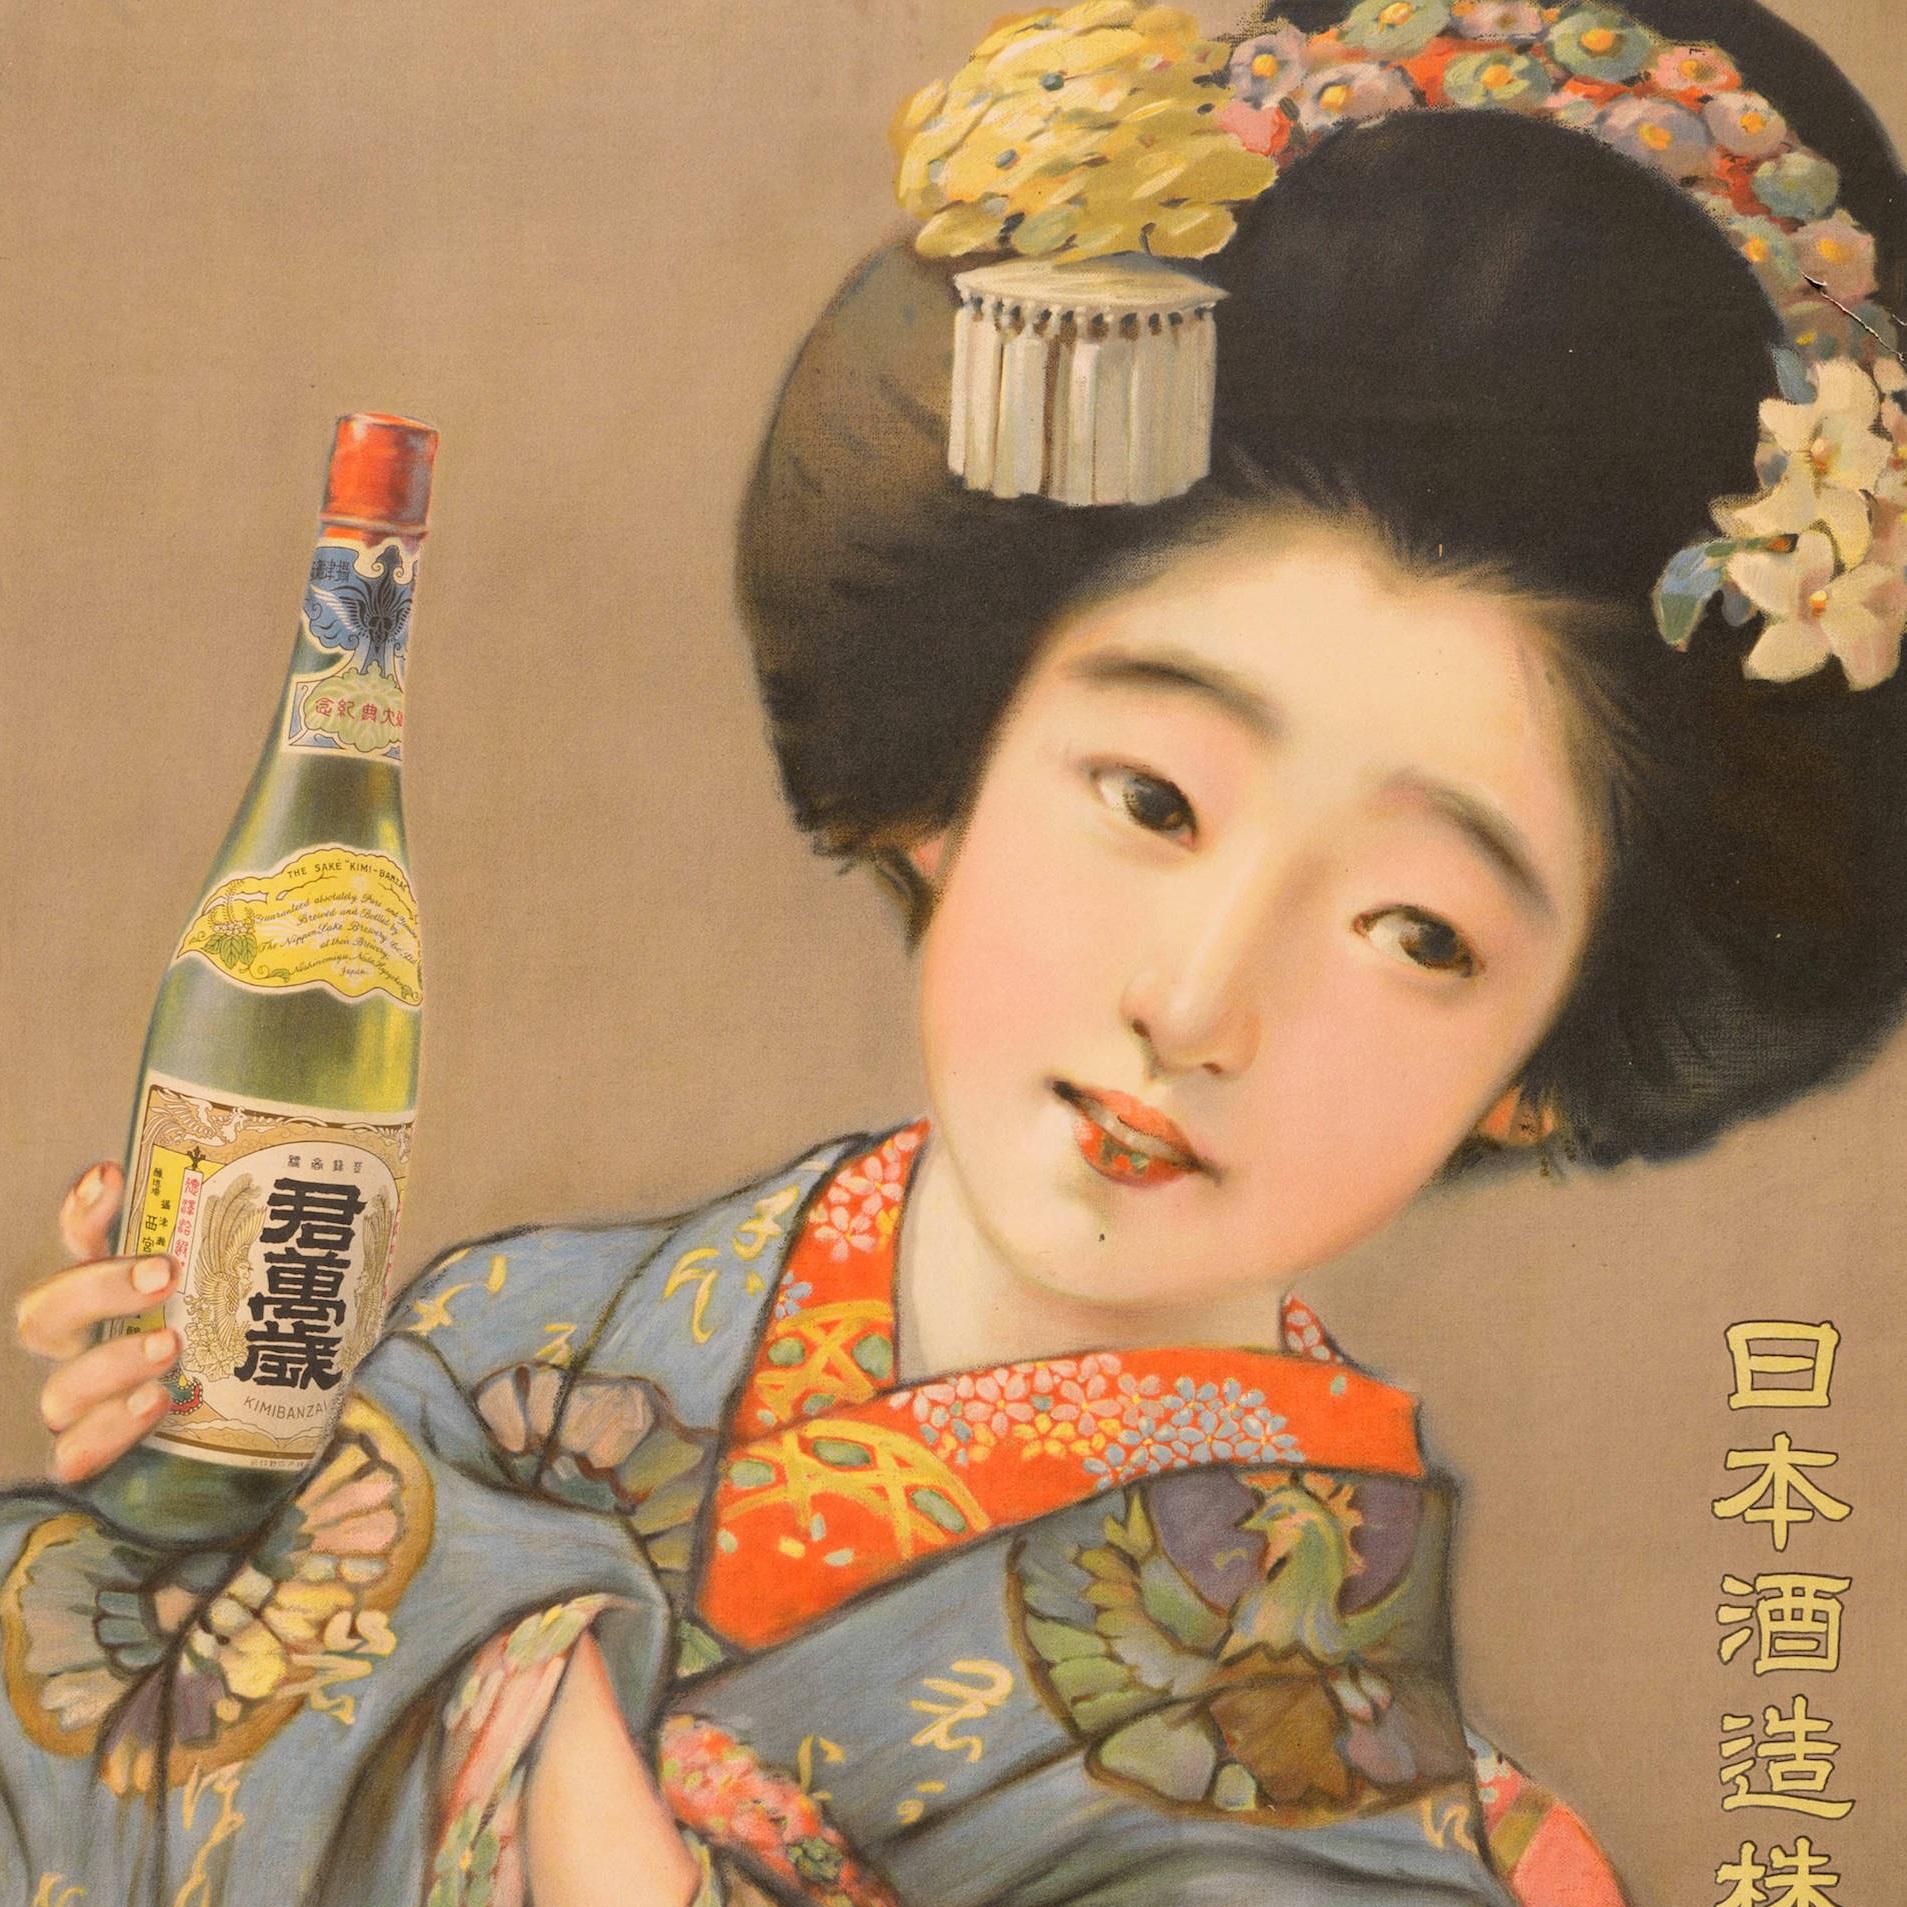 Vintage Japanese advertisement for sake.